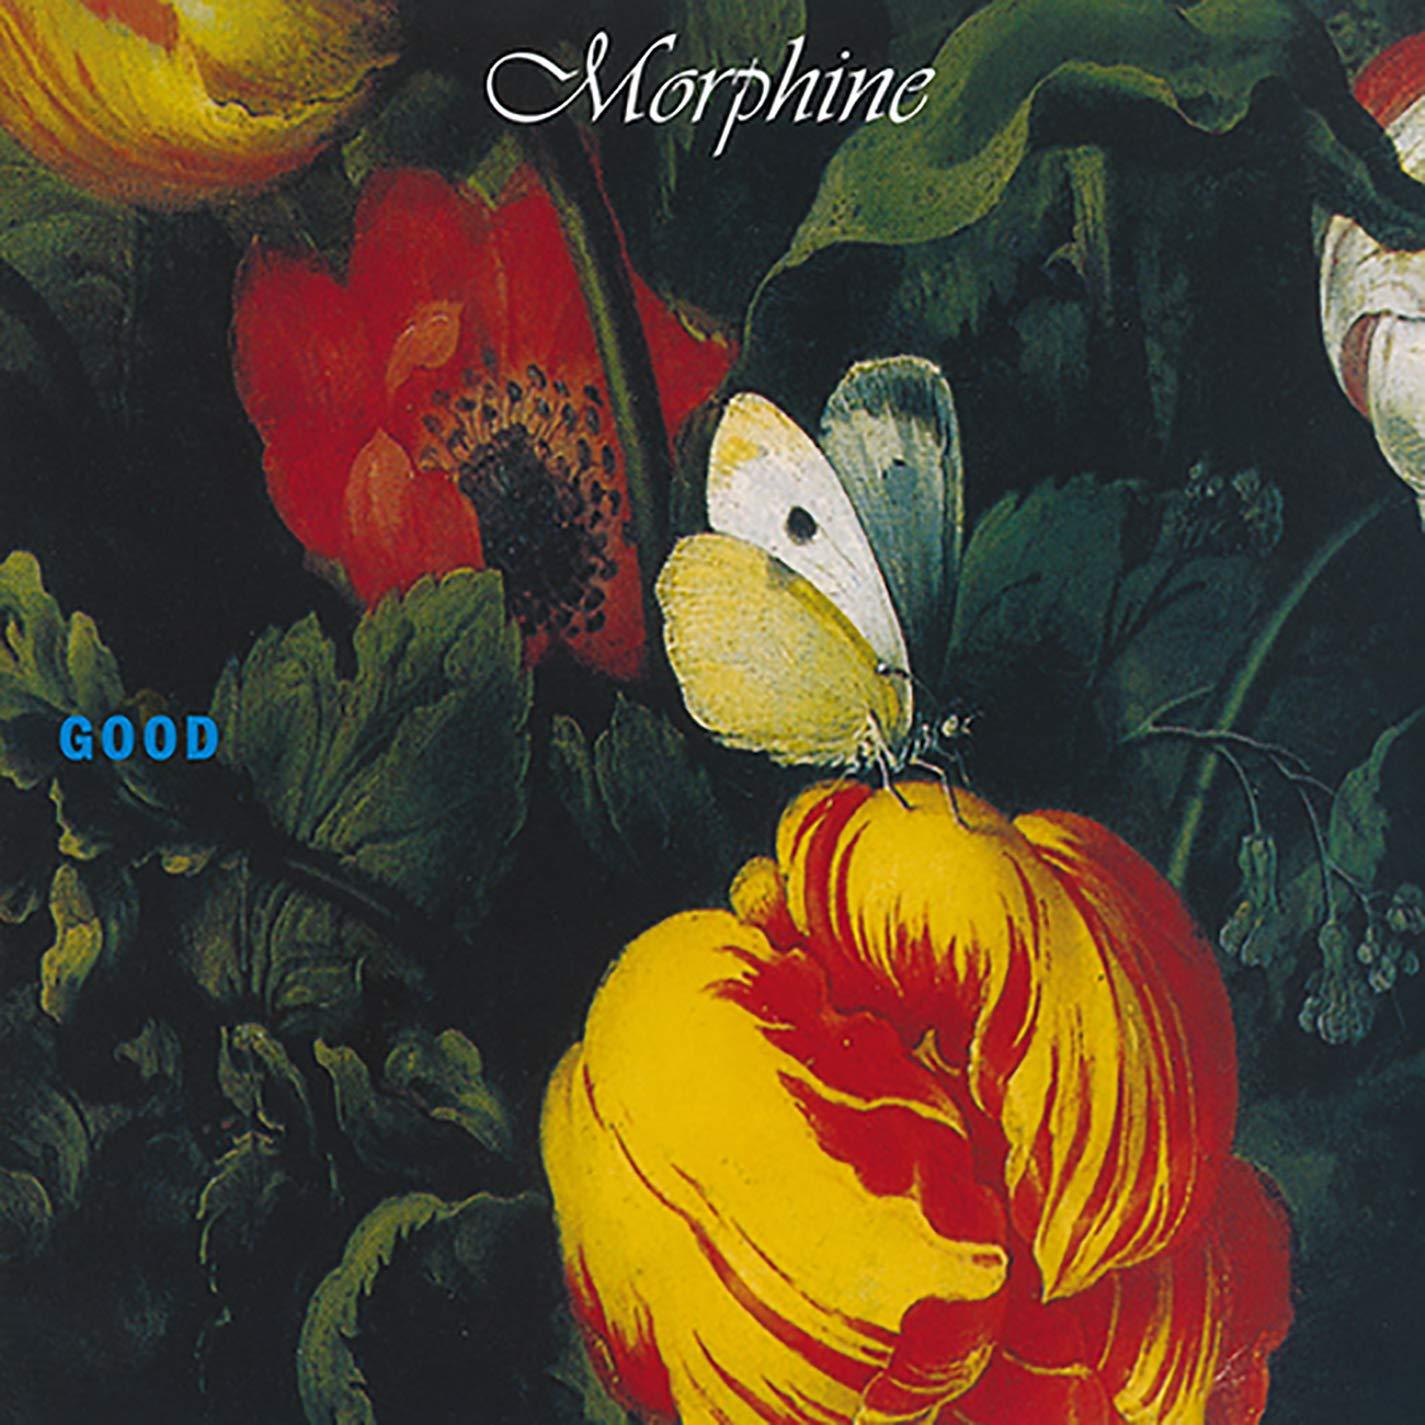 Copertina Vinile 33 giri Good di Morphine